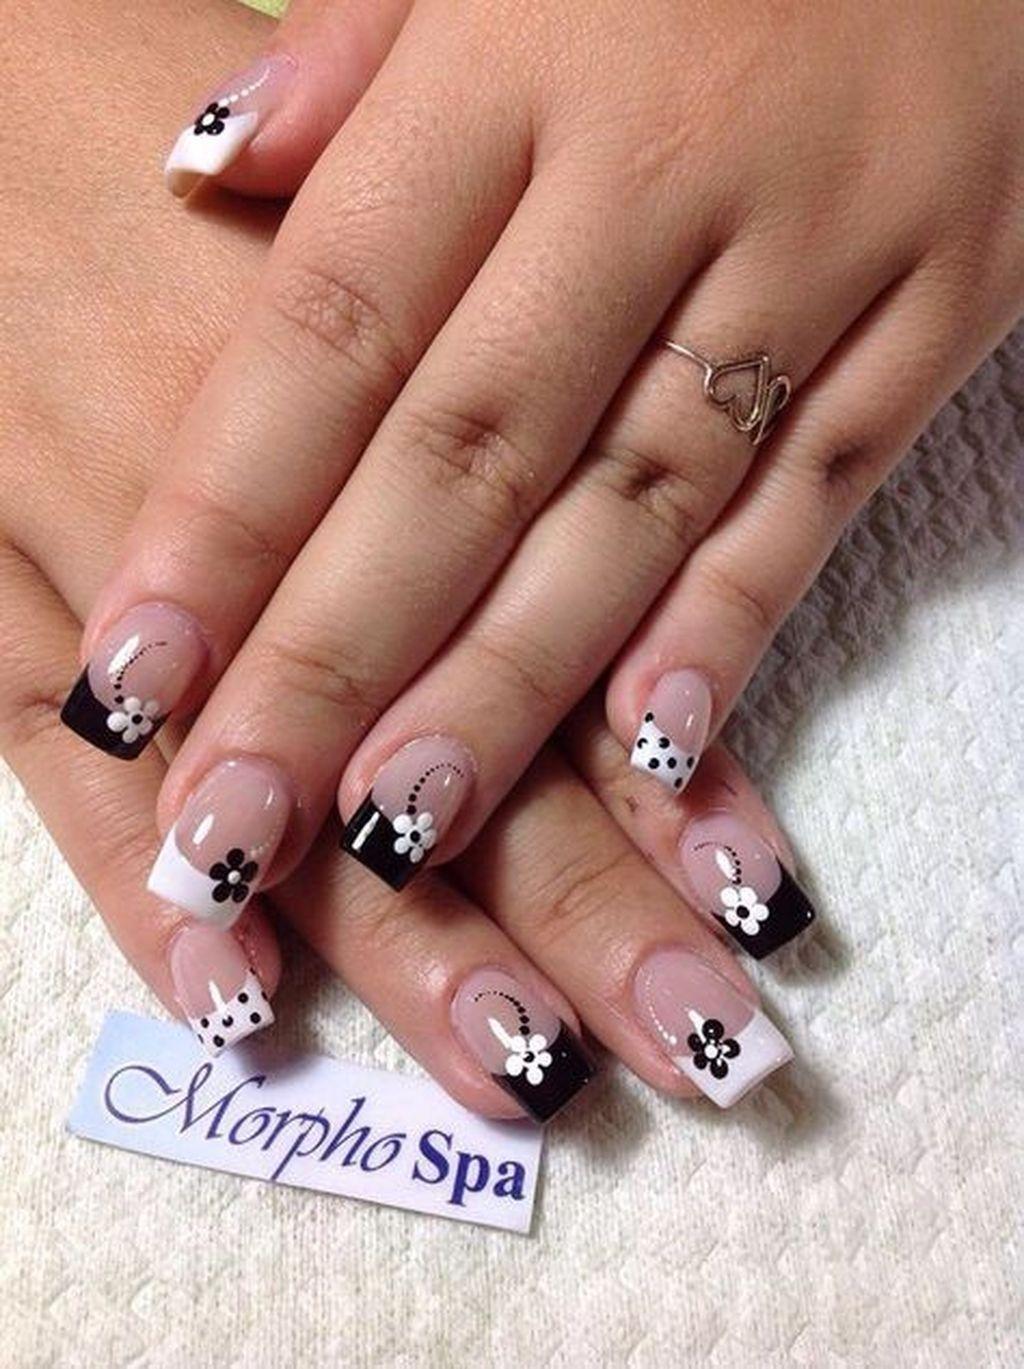 37 Amazing French Manicure Nail Art Designs Ideas Pedicure